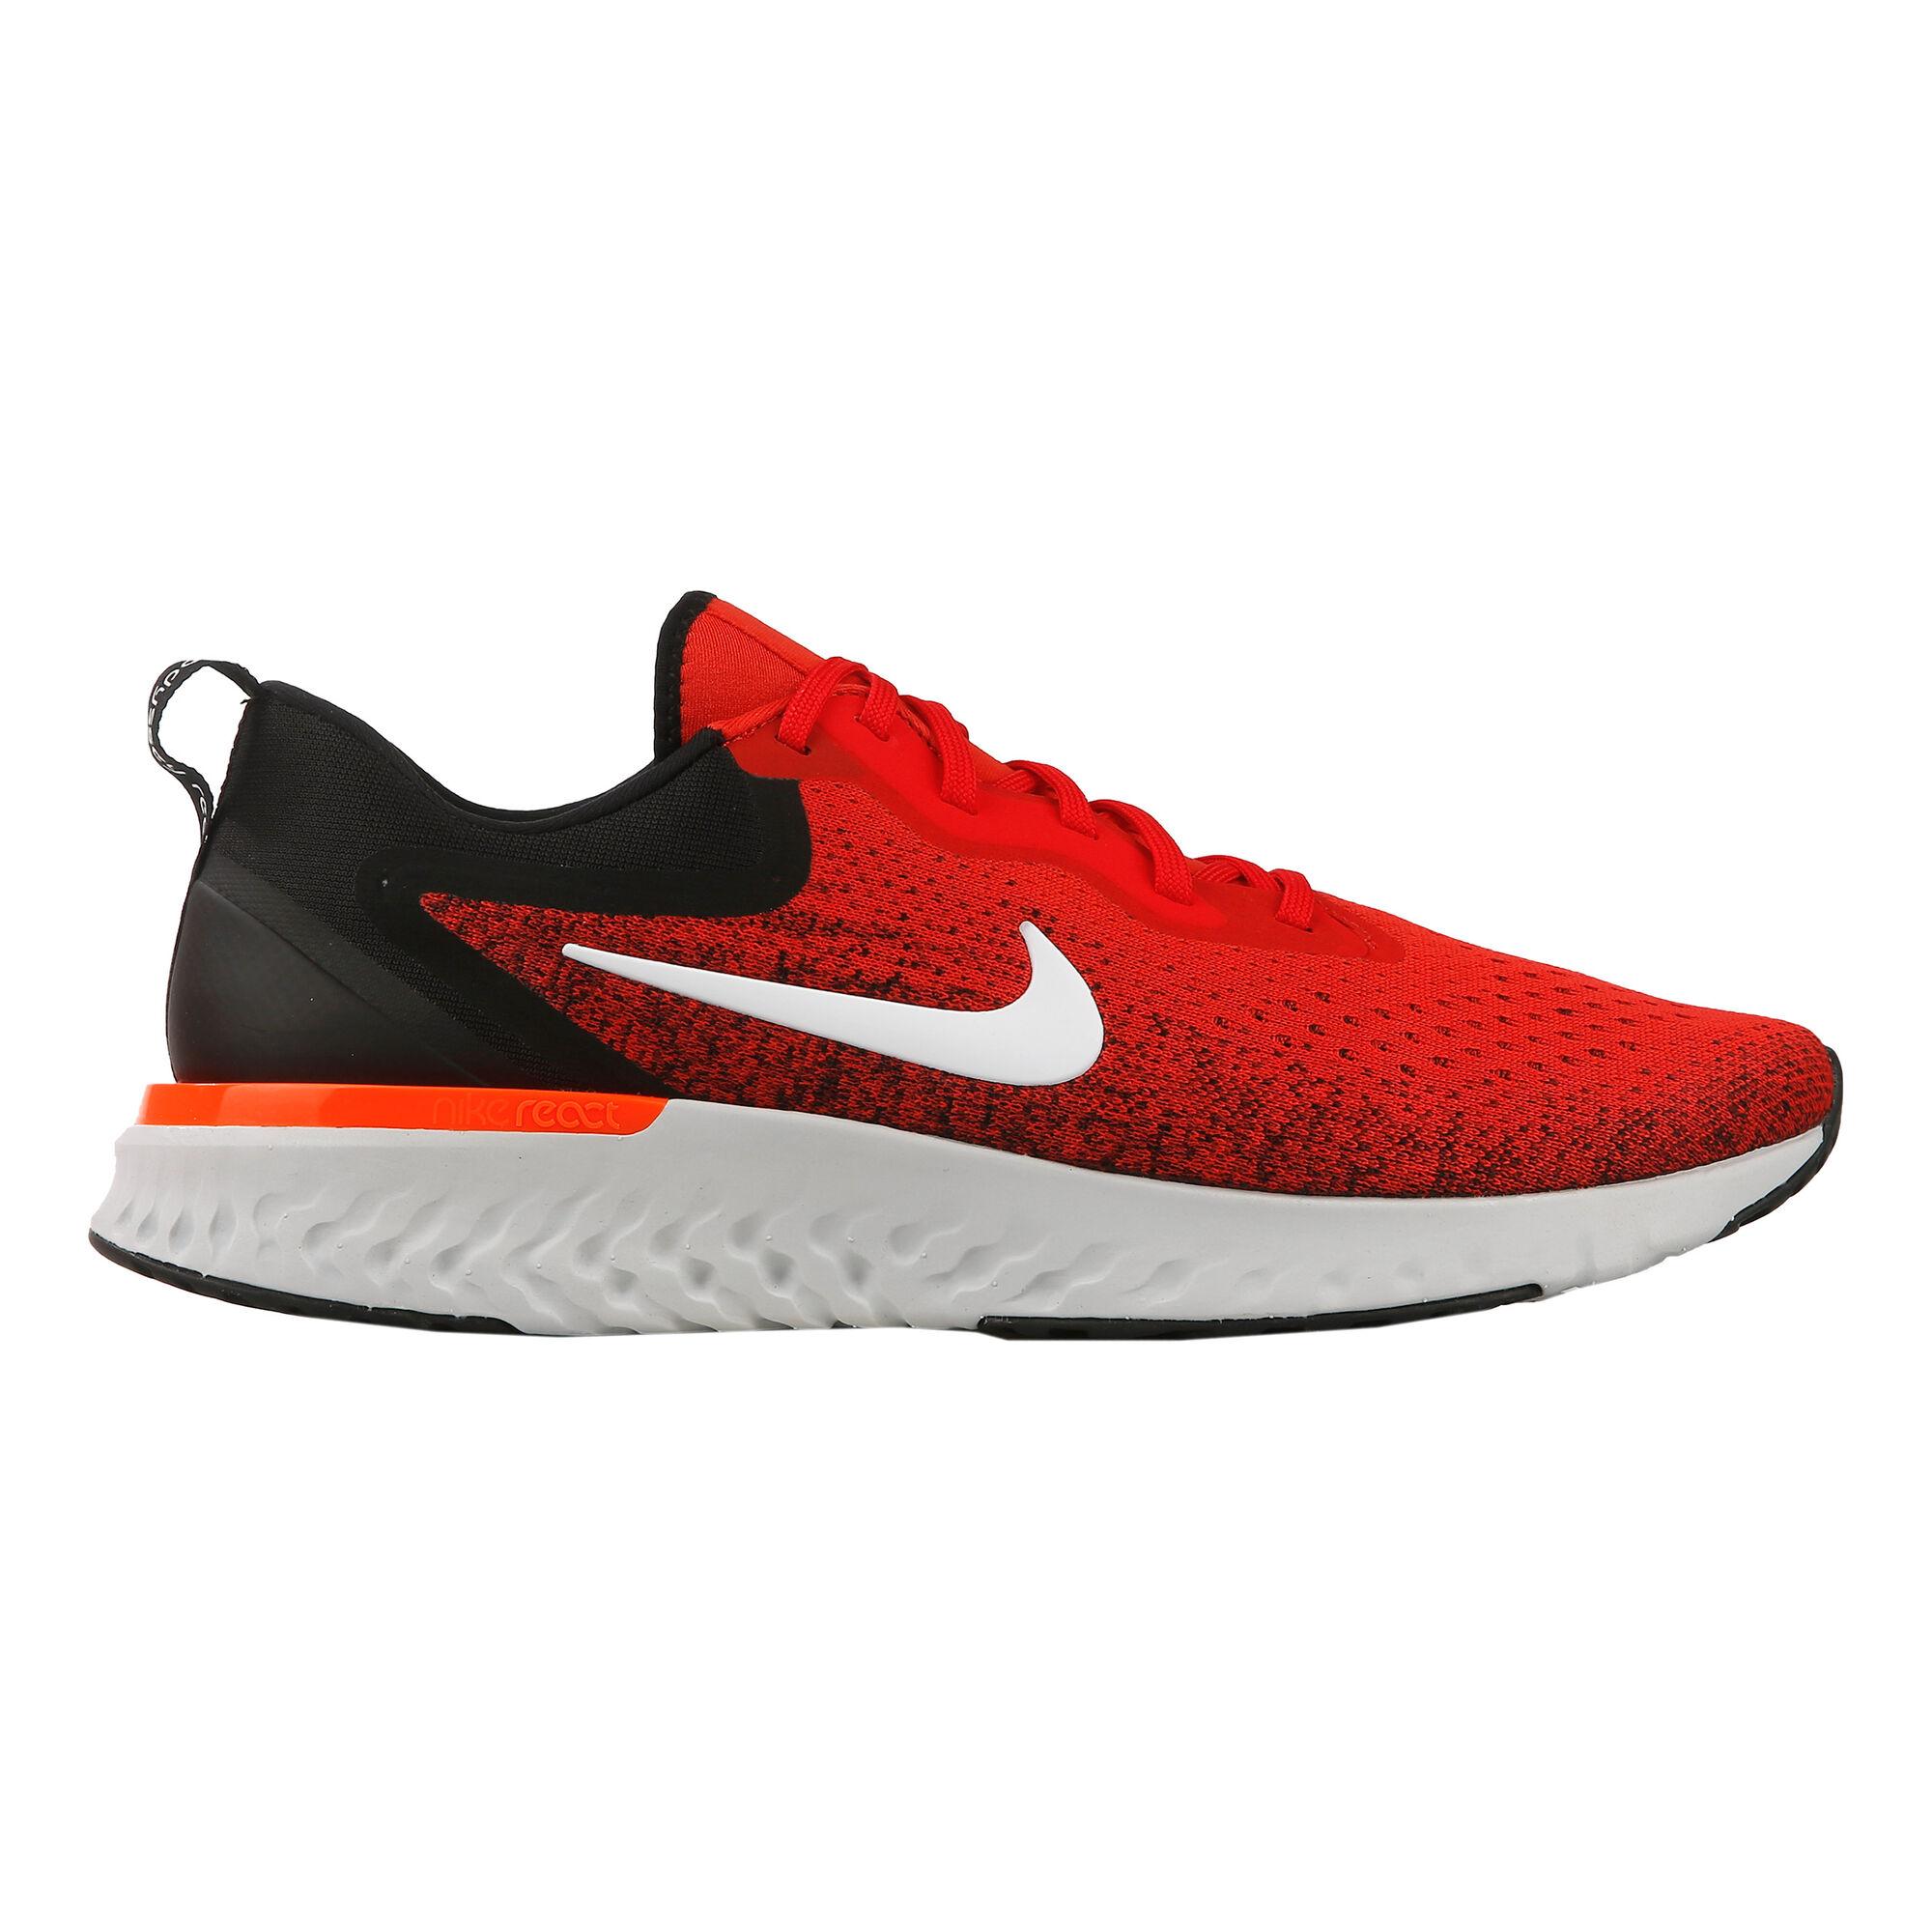 ccbe93ccb0ed buy Nike Odyssey React Neutral Running Shoe Men - Red